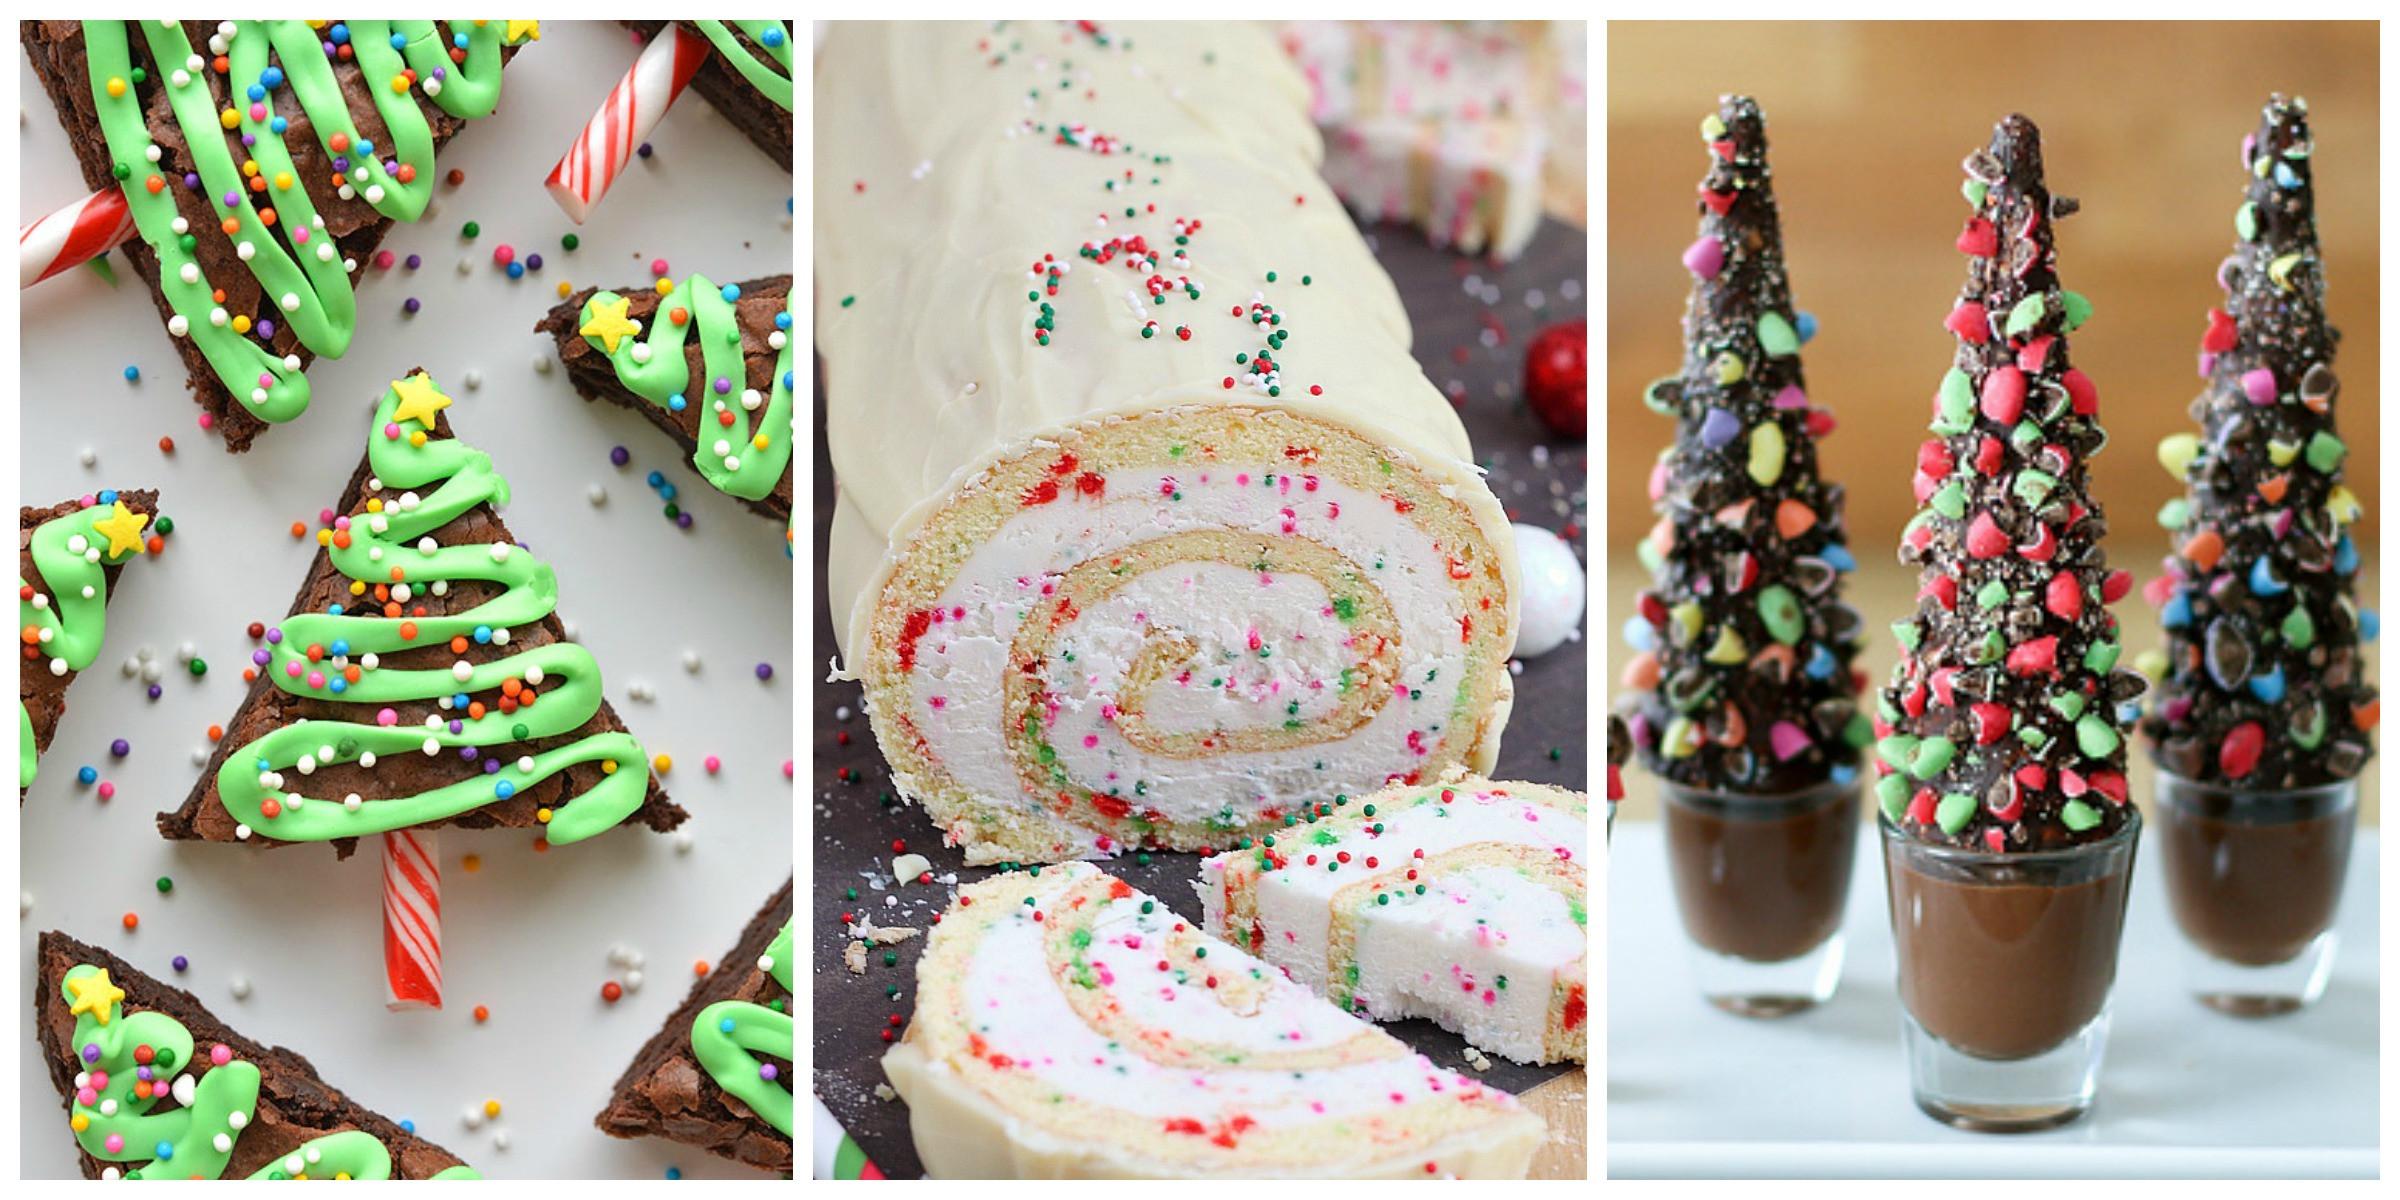 Simple Christmas Desserts Recipes  57 Easy Christmas Dessert Recipes Best Ideas for Fun